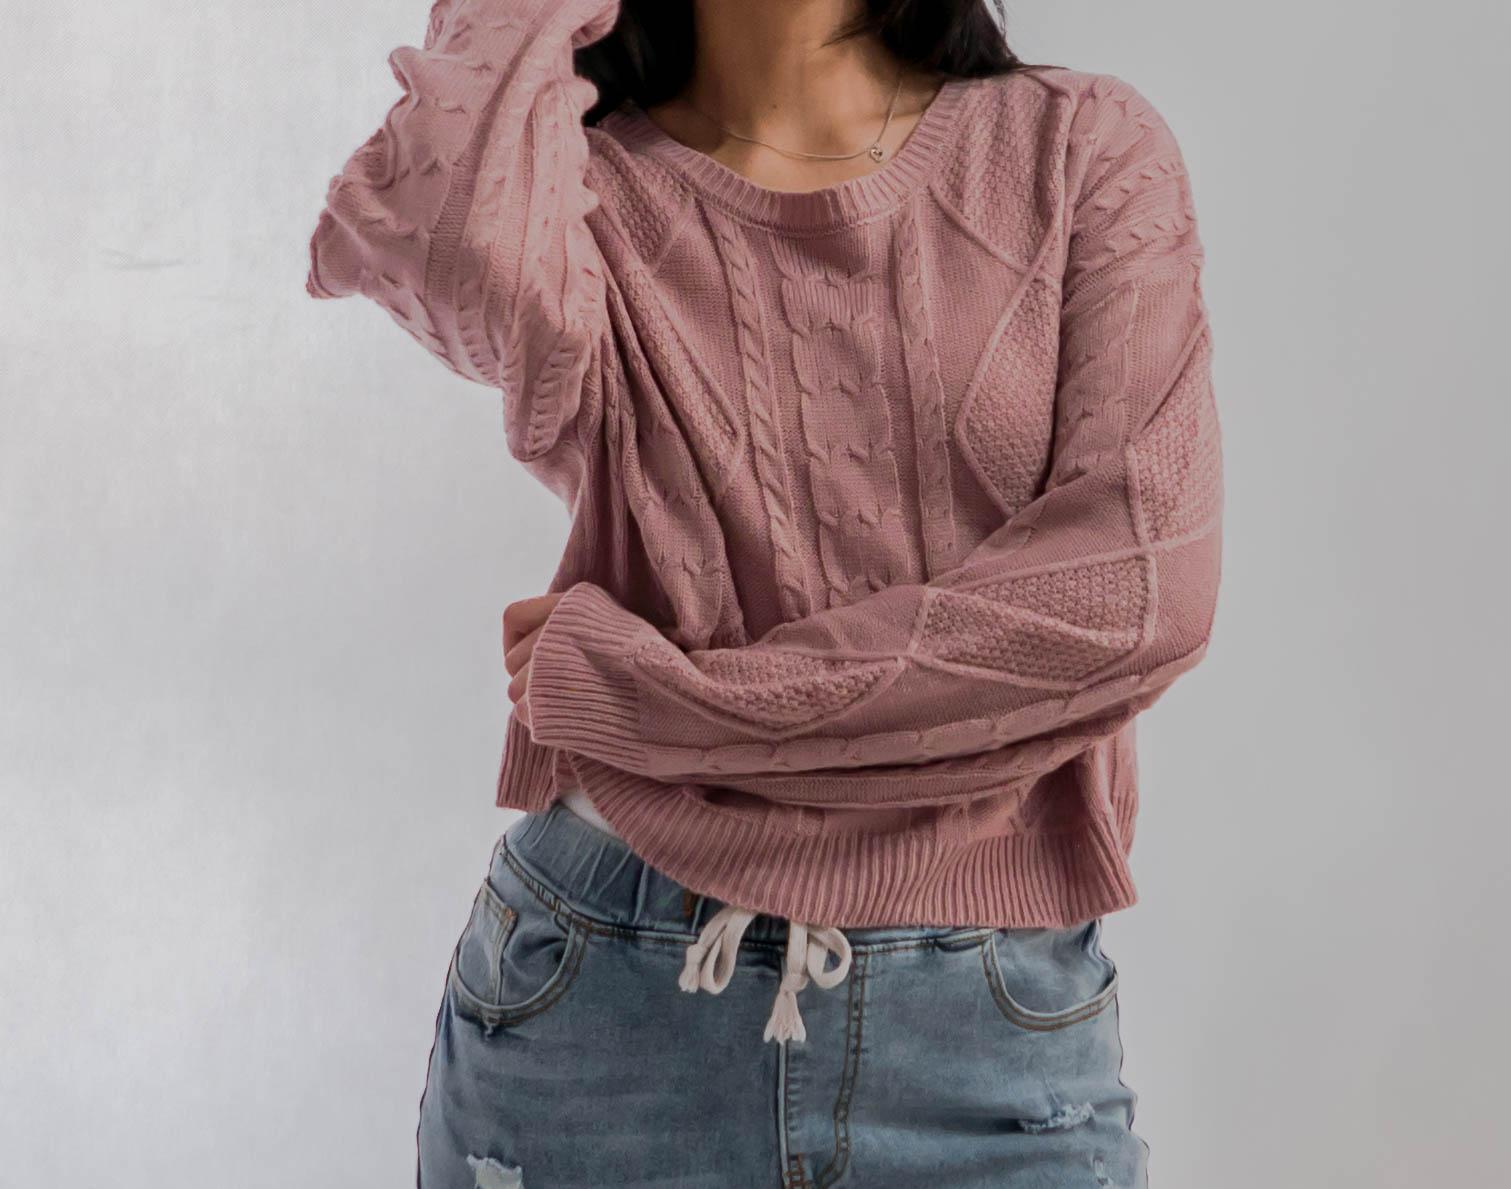 ciepłe swetry zima 2020